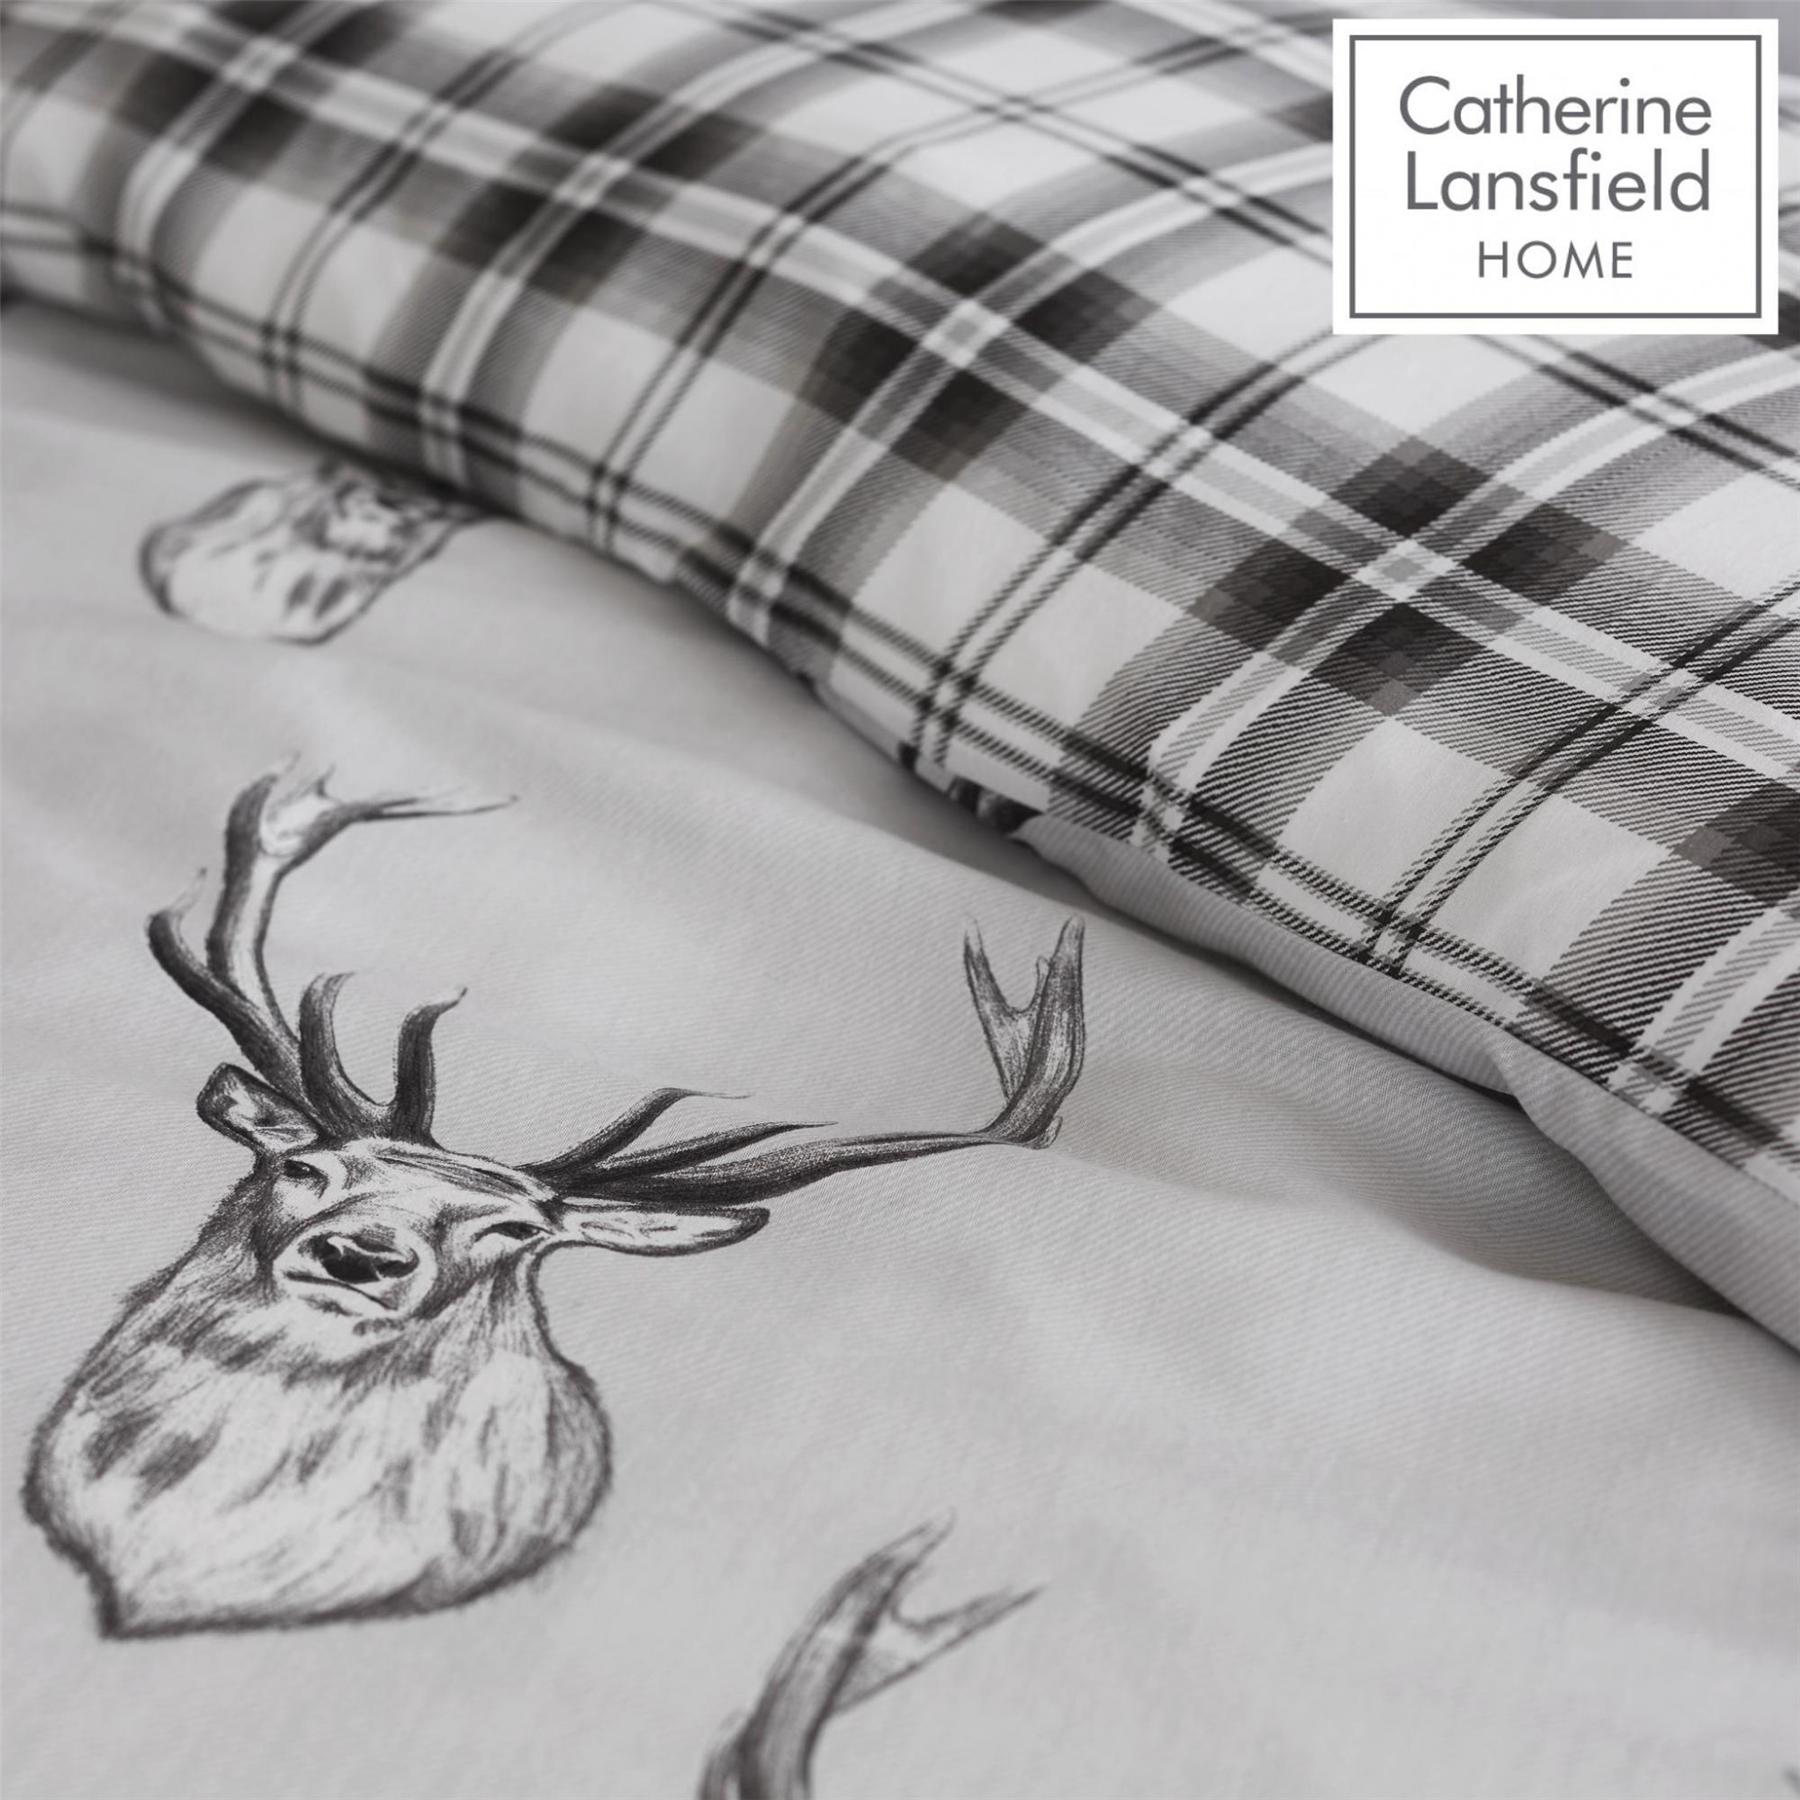 Catherine-Lansfield-Duvet-Set-Highland-Stag-Reversible-Check-Bedding-Grey thumbnail 7